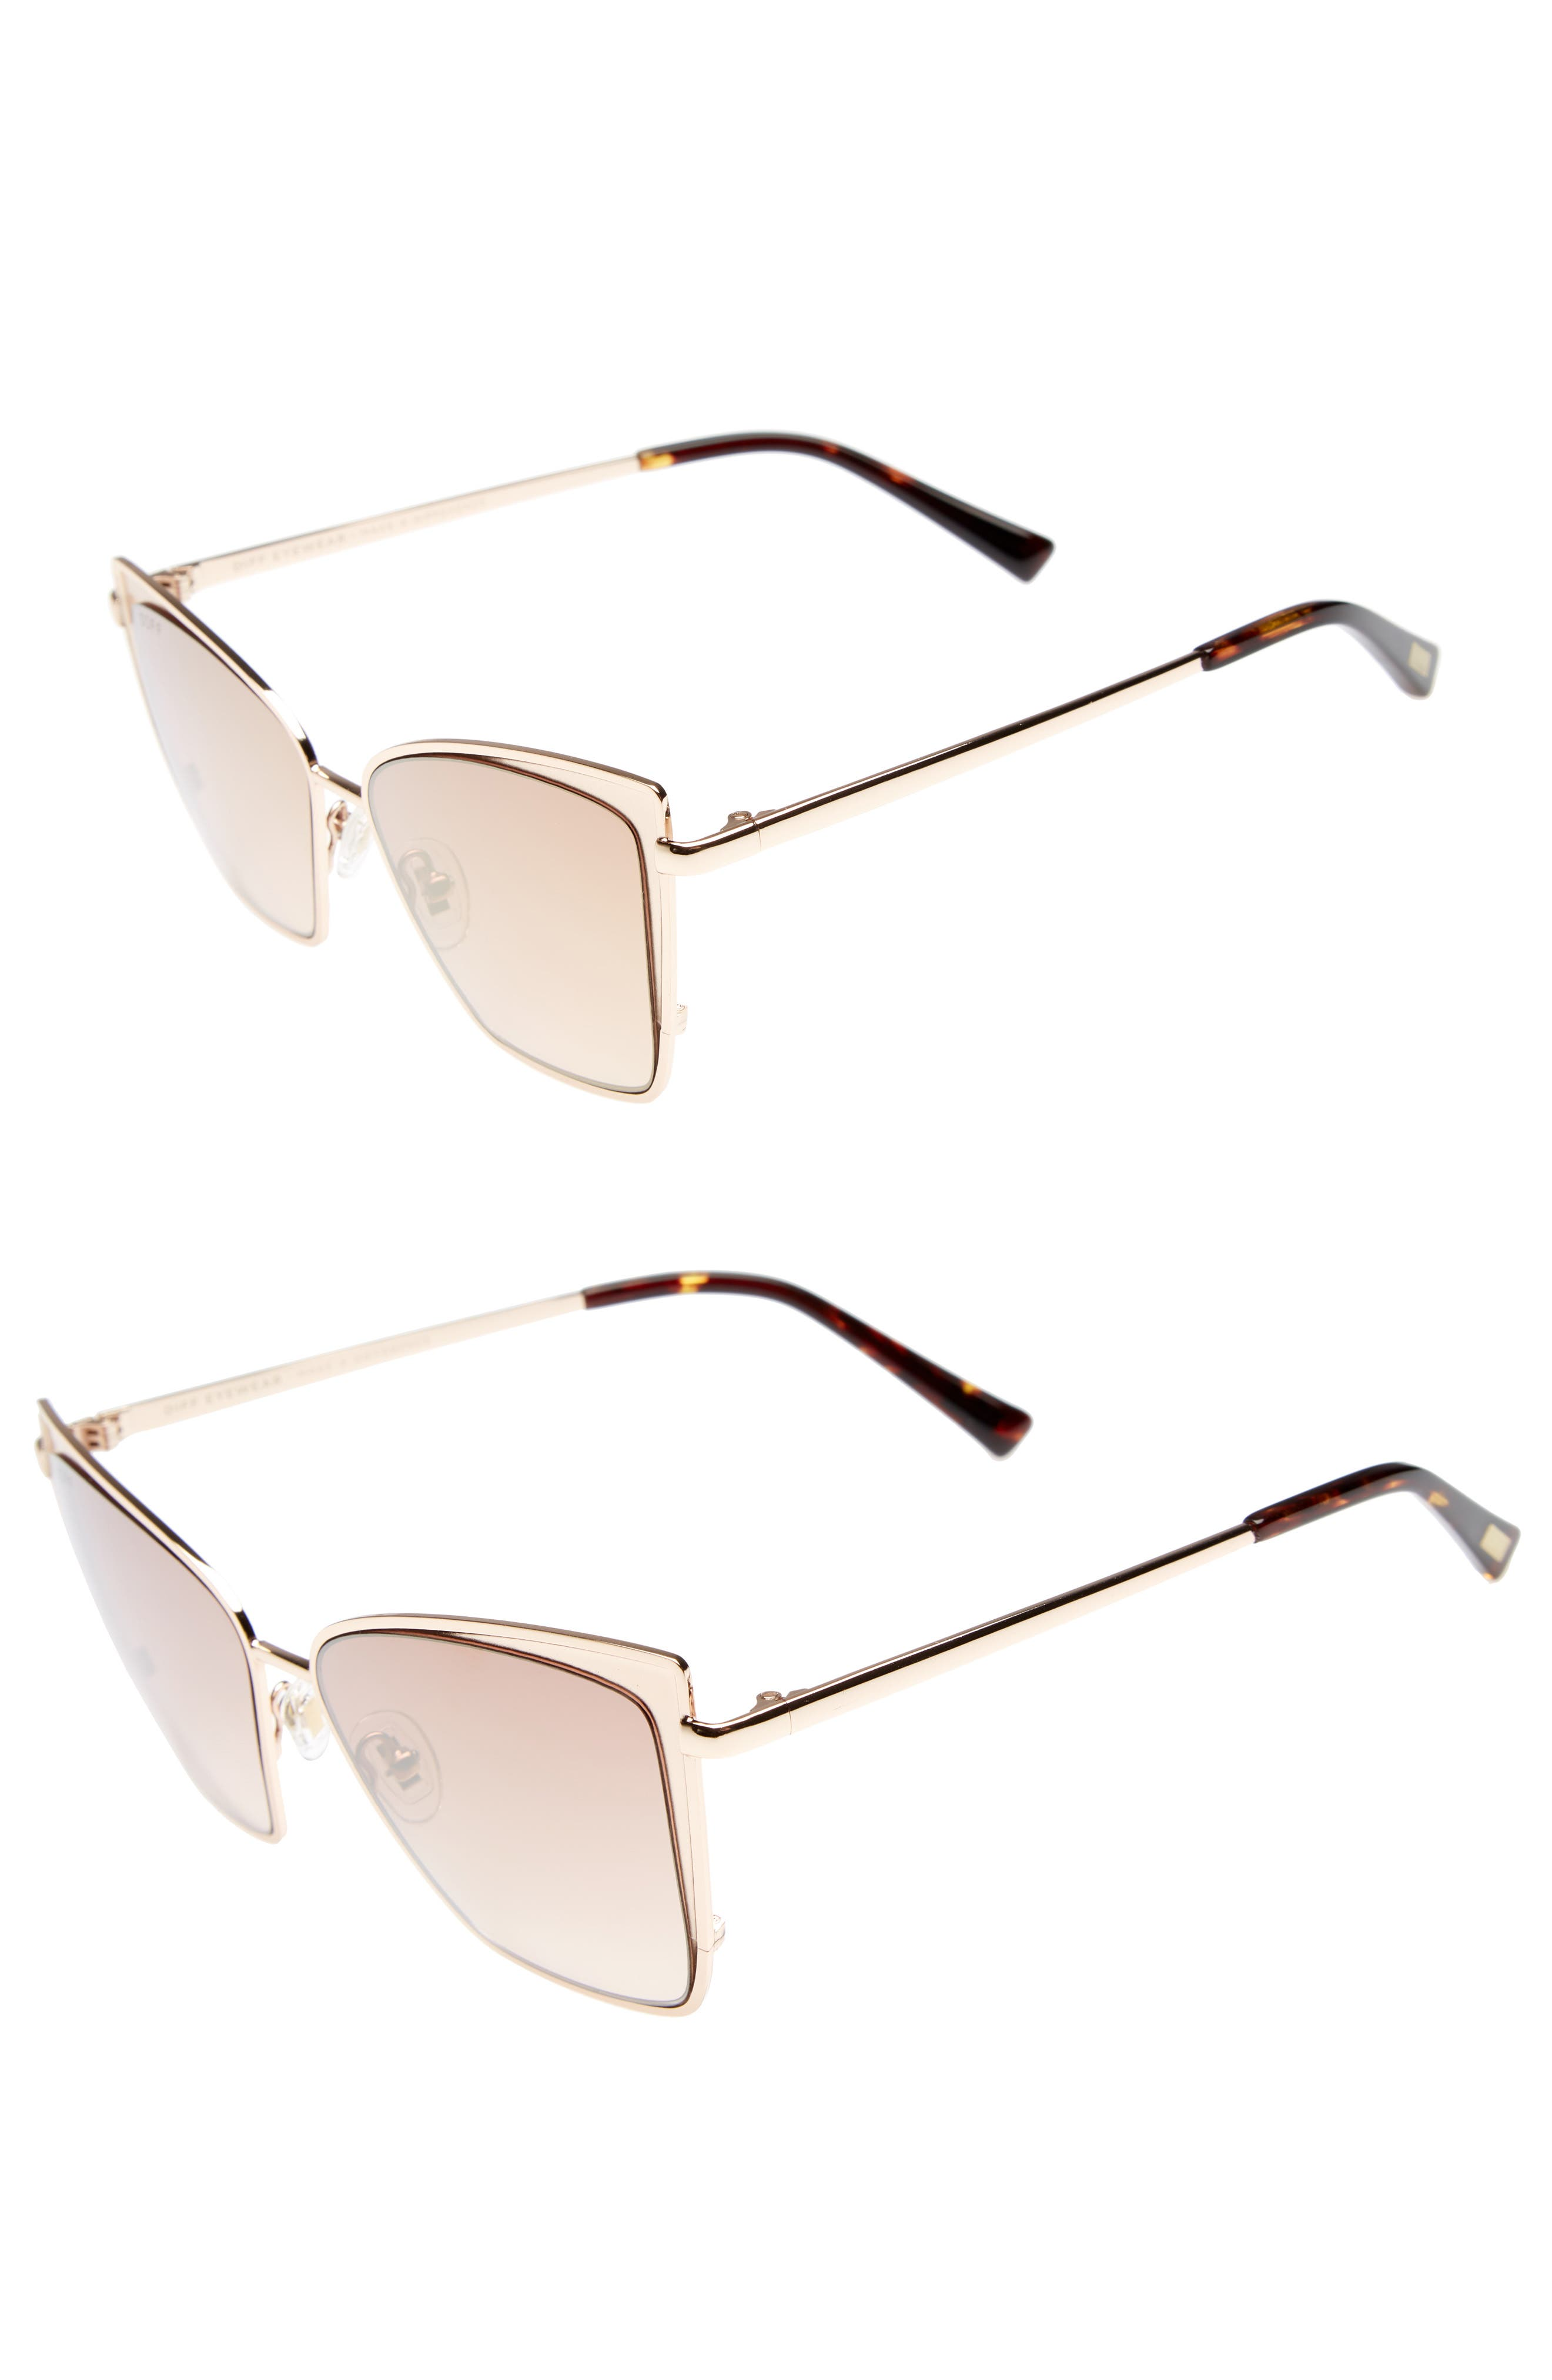 Mommy & Me Becky 2-Pack Cat Eye Sunglasses,                             Alternate thumbnail 2, color,                             Gold/ Brown